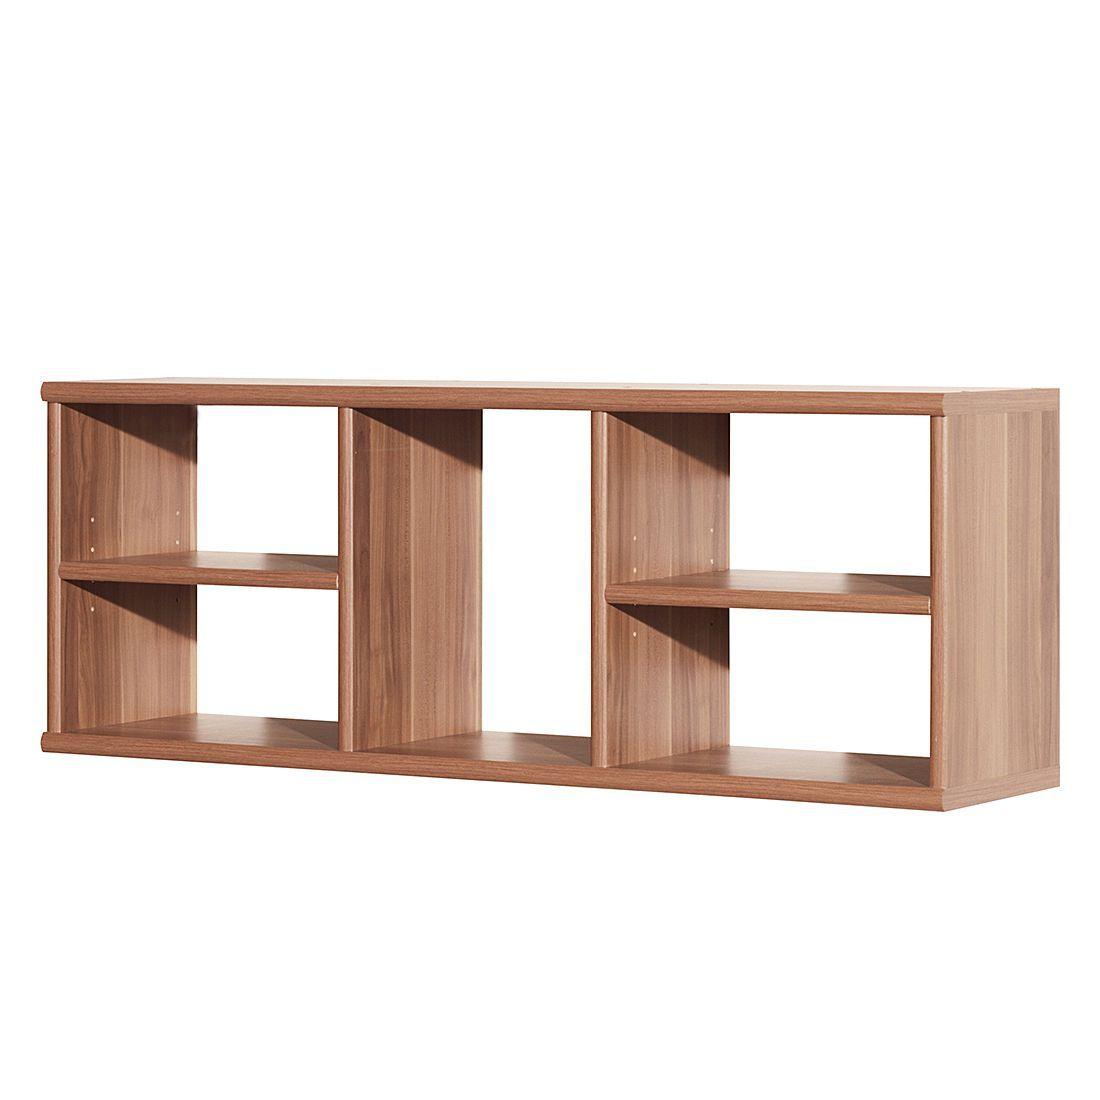 Wandregal Soft Plus II   Nussbaum Dekor, Cs Schmal Jetzt Bestellen Unter:  Https: